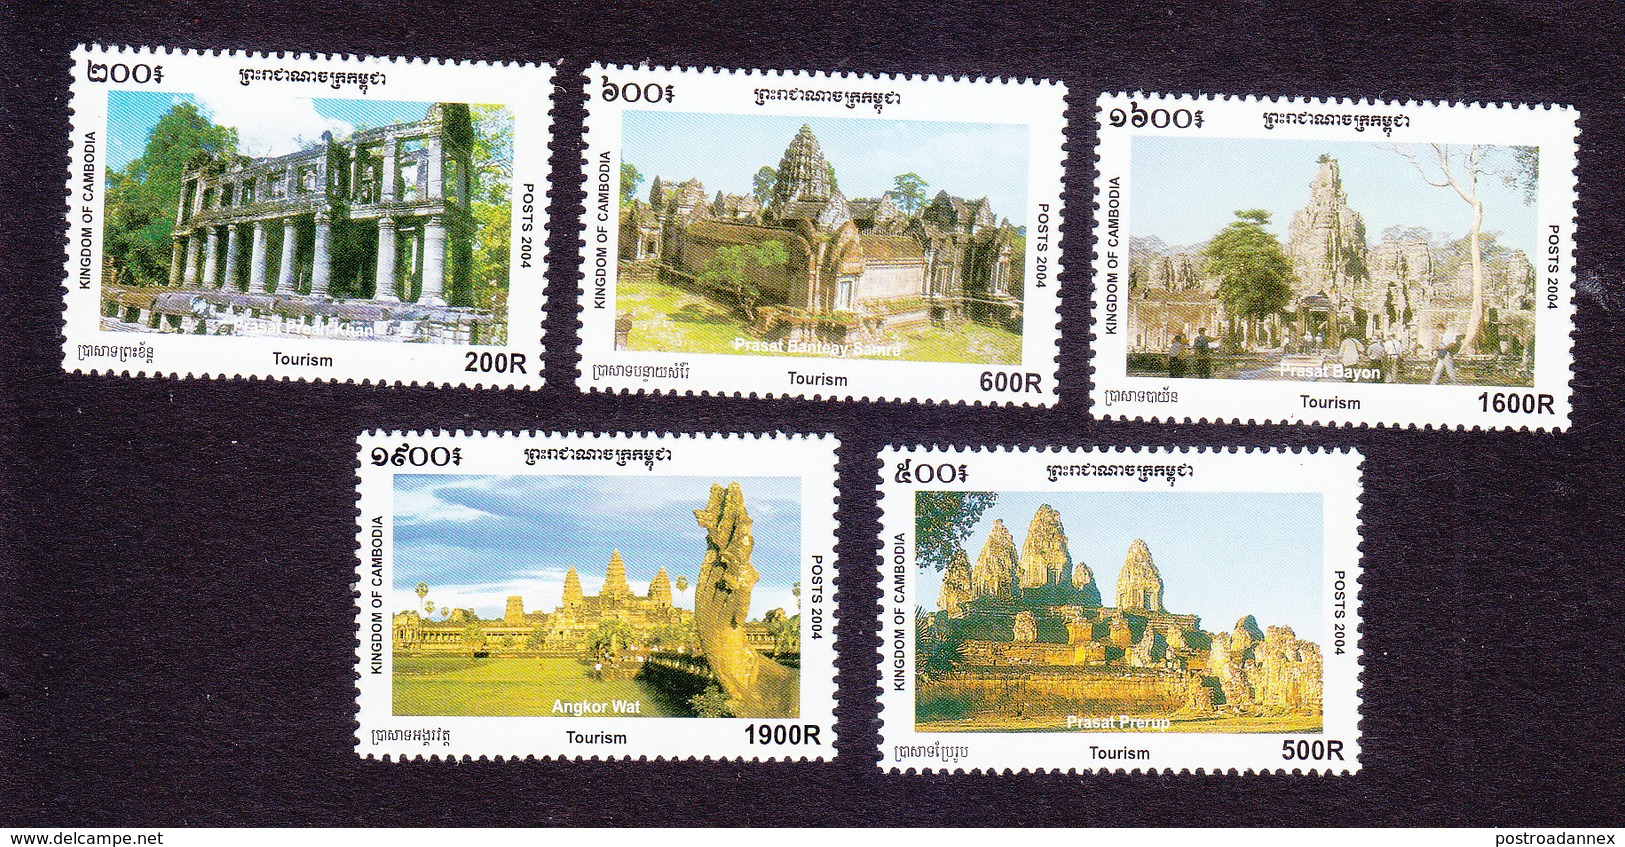 Cambodia, Scott #2230-2234, Mint Hinged, Tourism, Issued 2004 - Cambodge